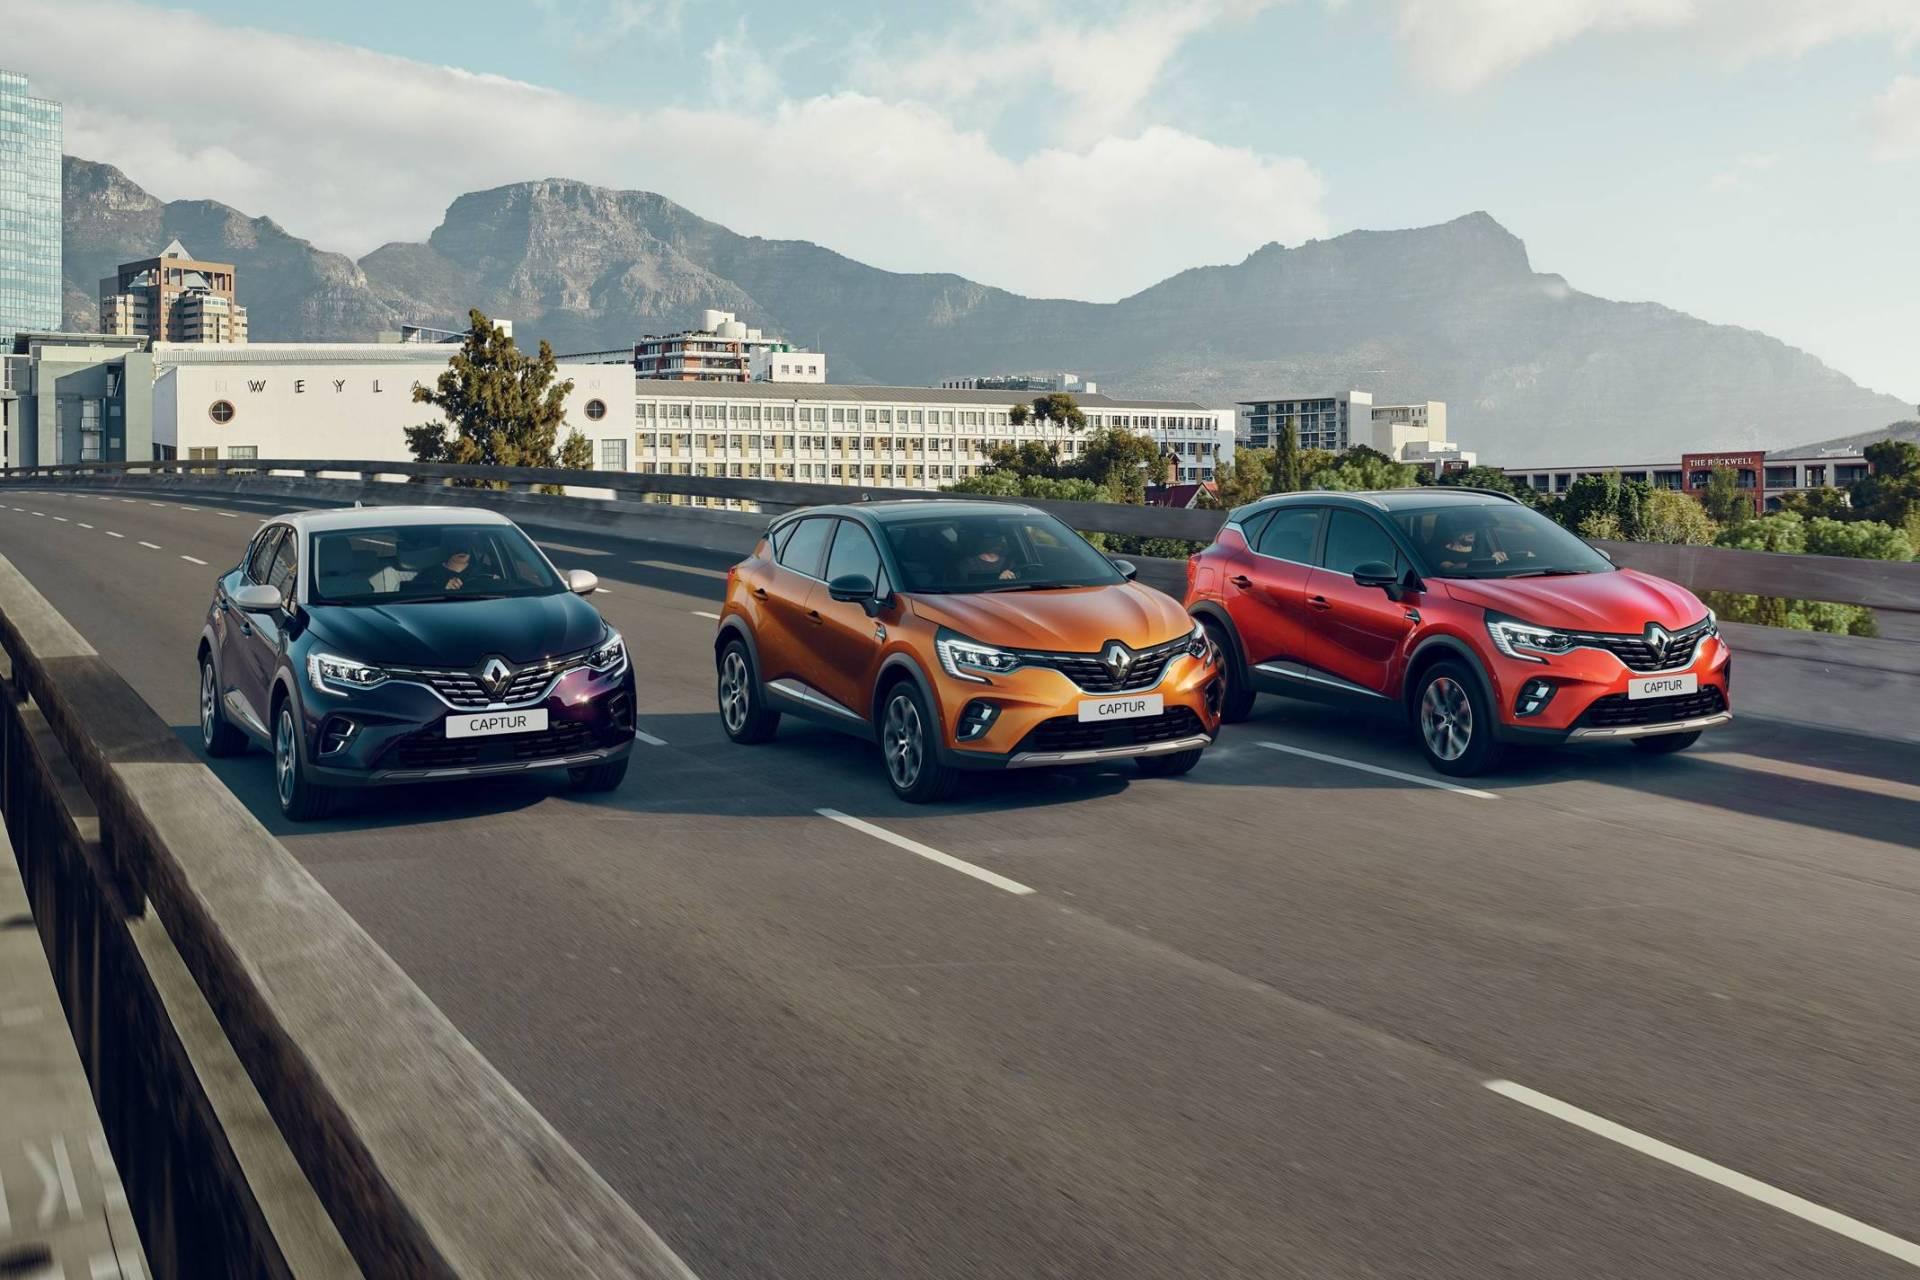 NOWE KOLORY Renault Captur